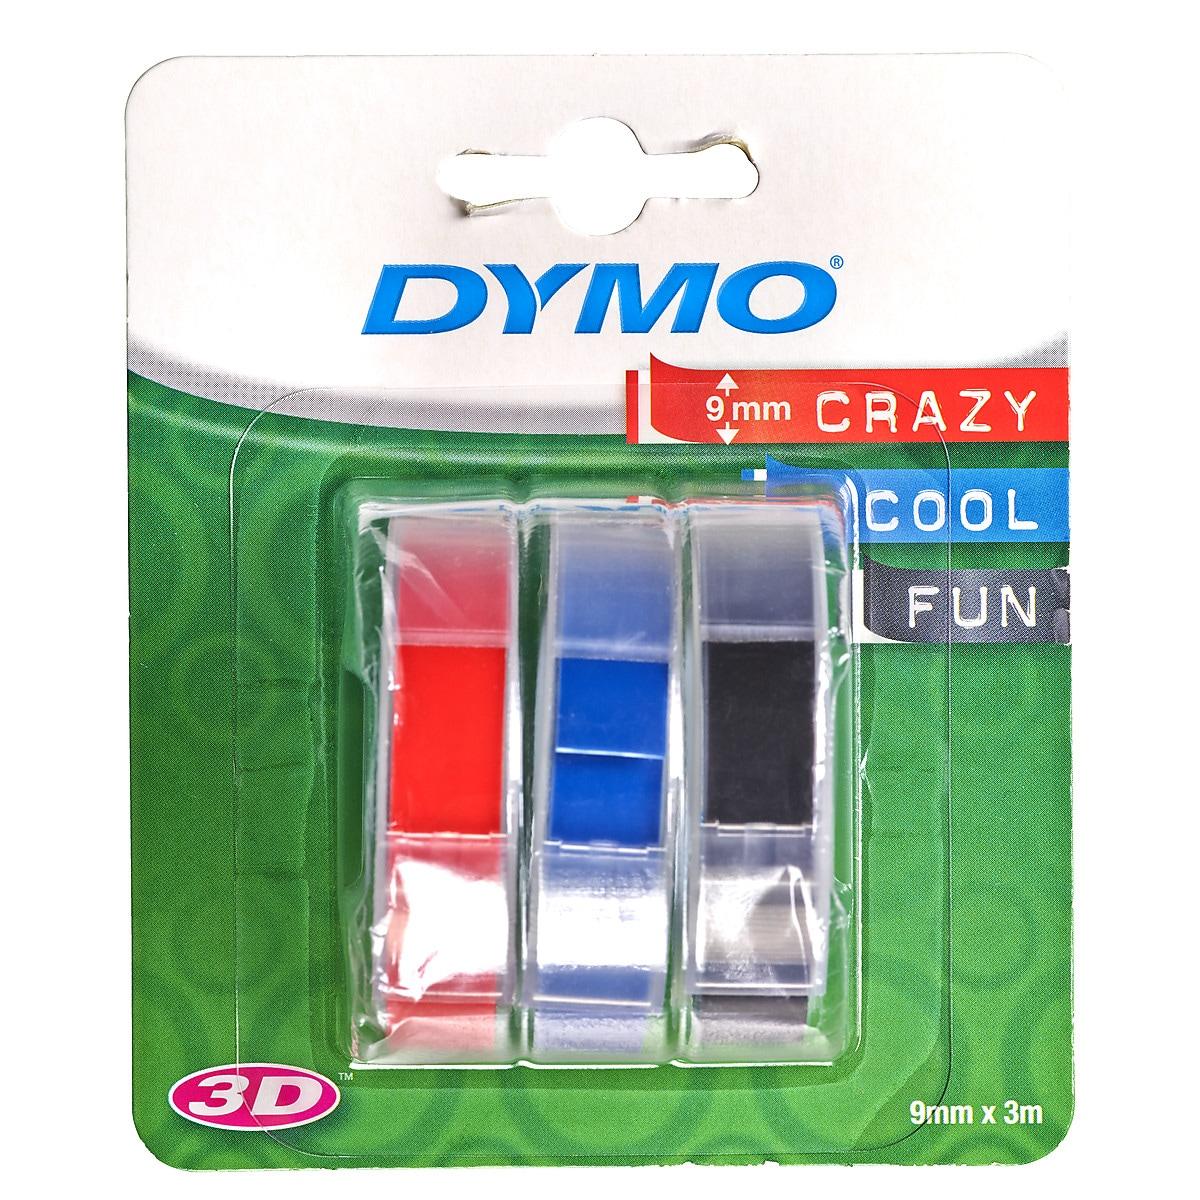 Tarranauha Dymo 3D 3 kpl